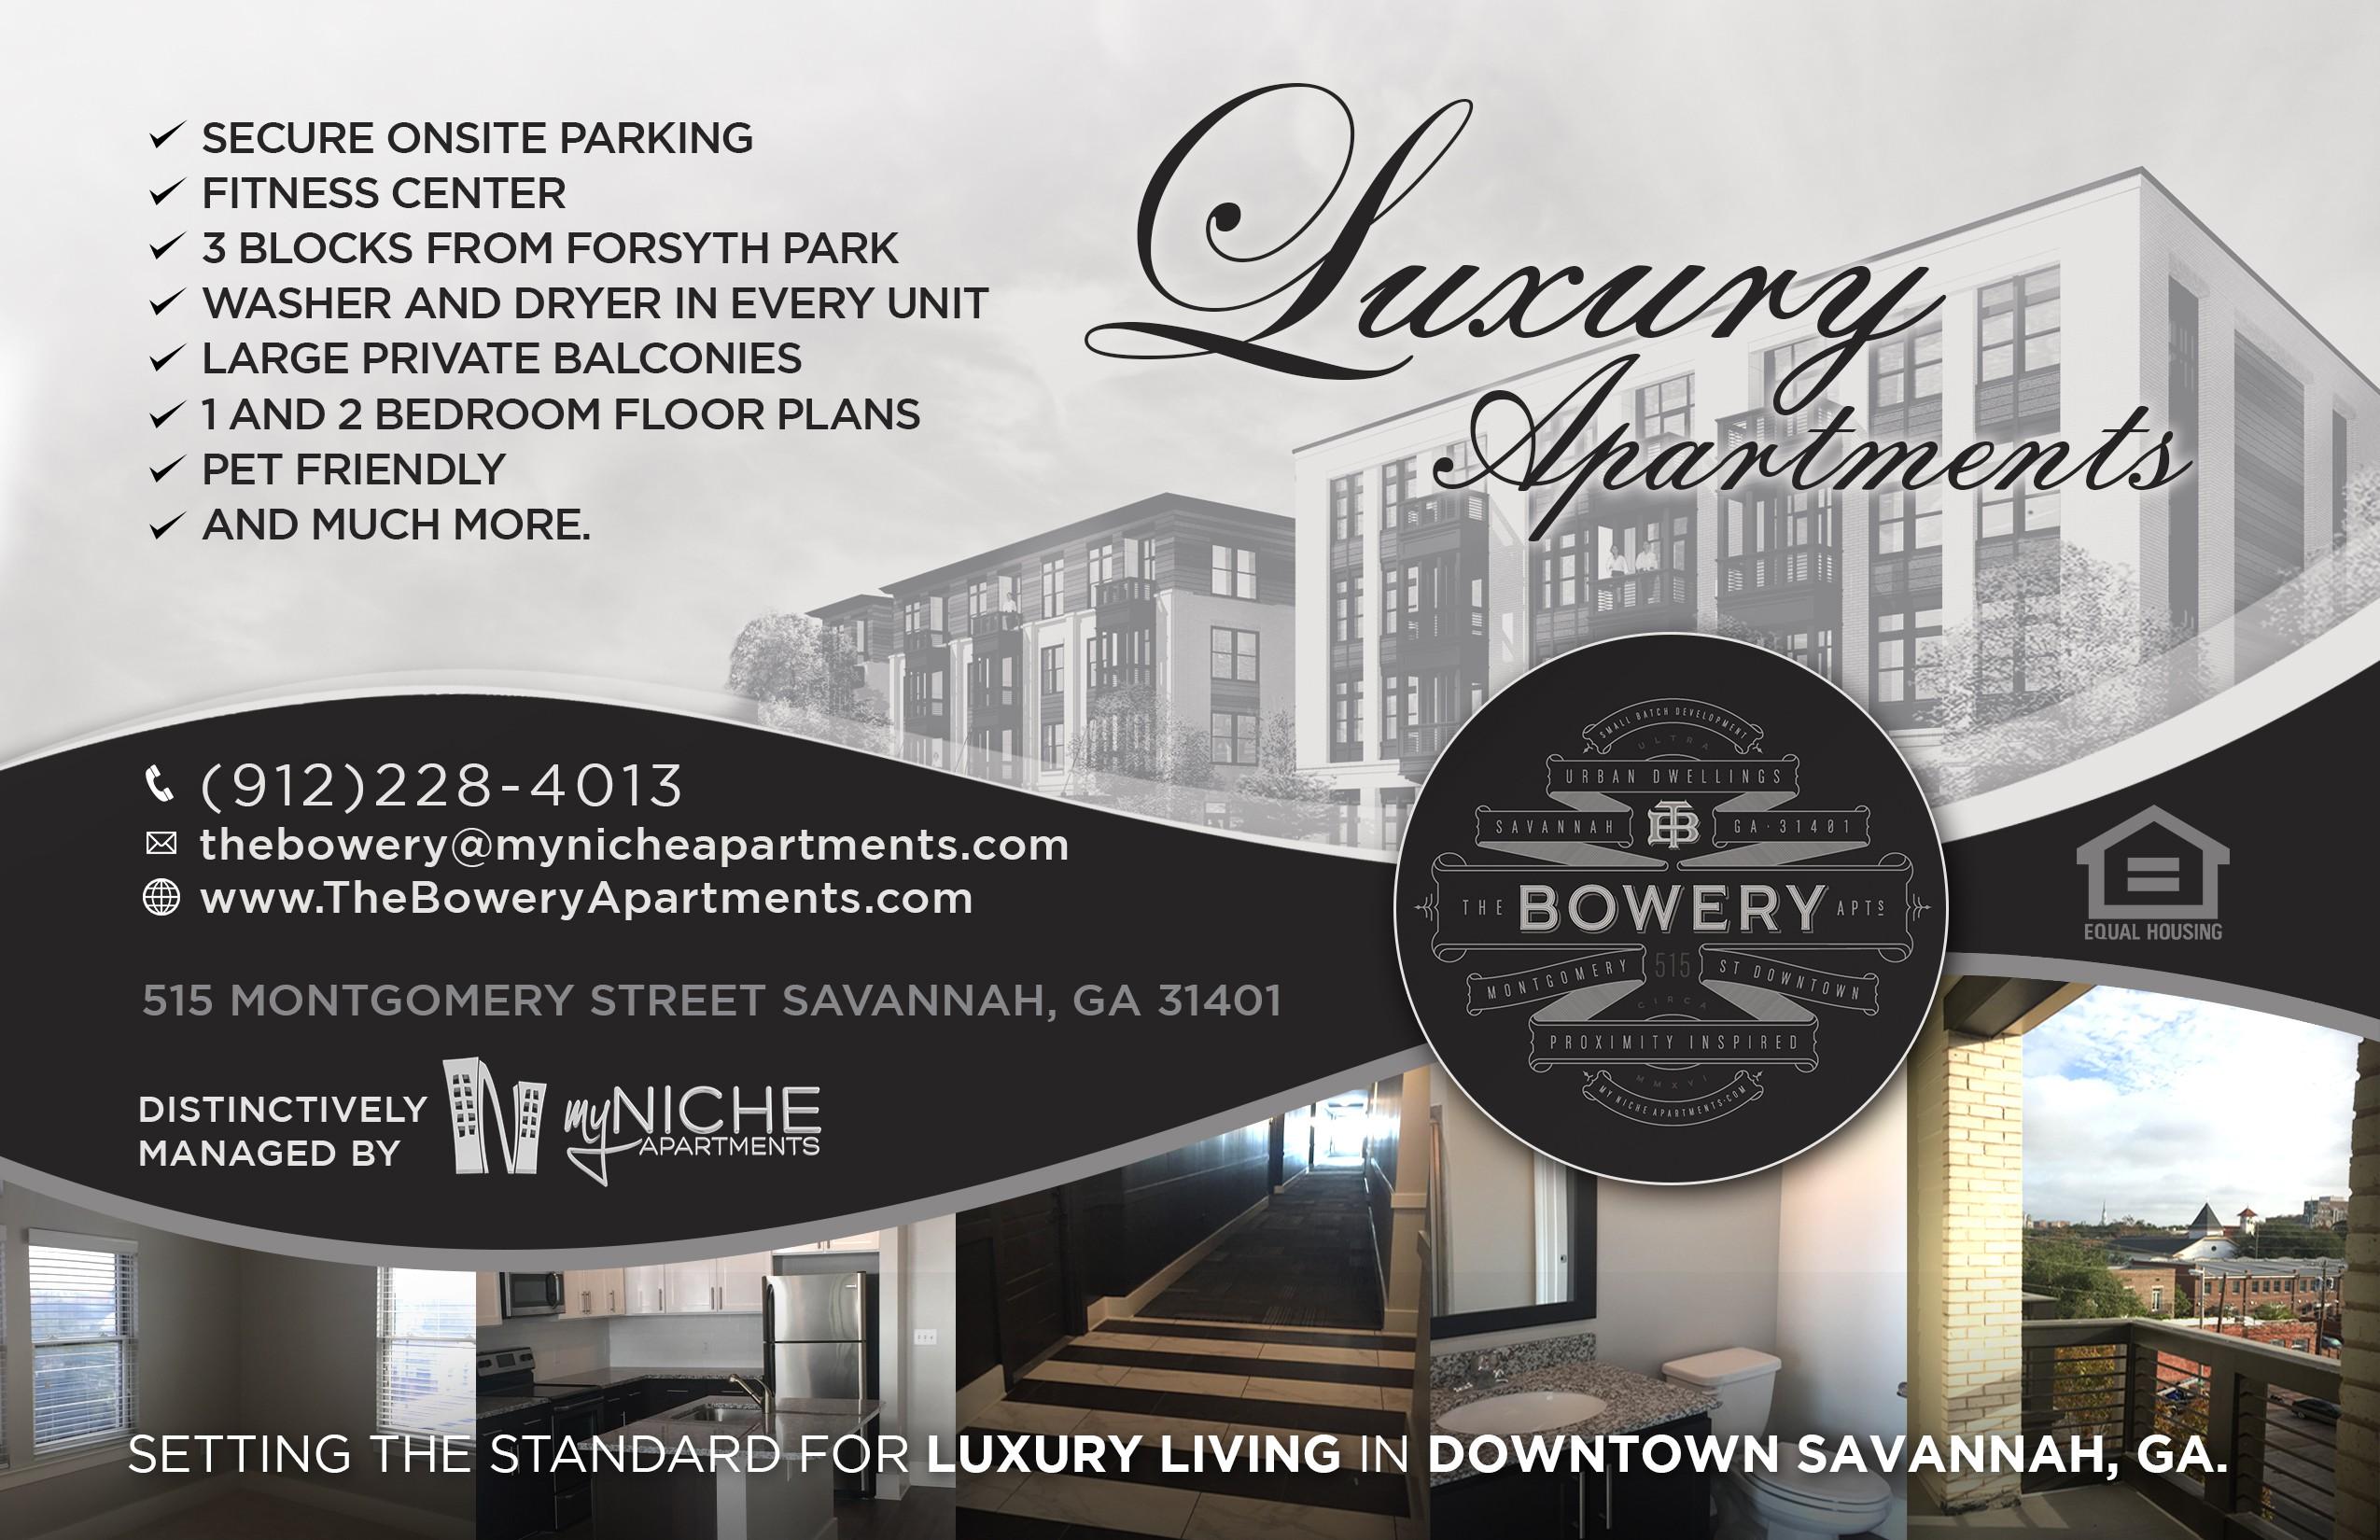 Savannah Magazine Ad-The Bowery Apartments